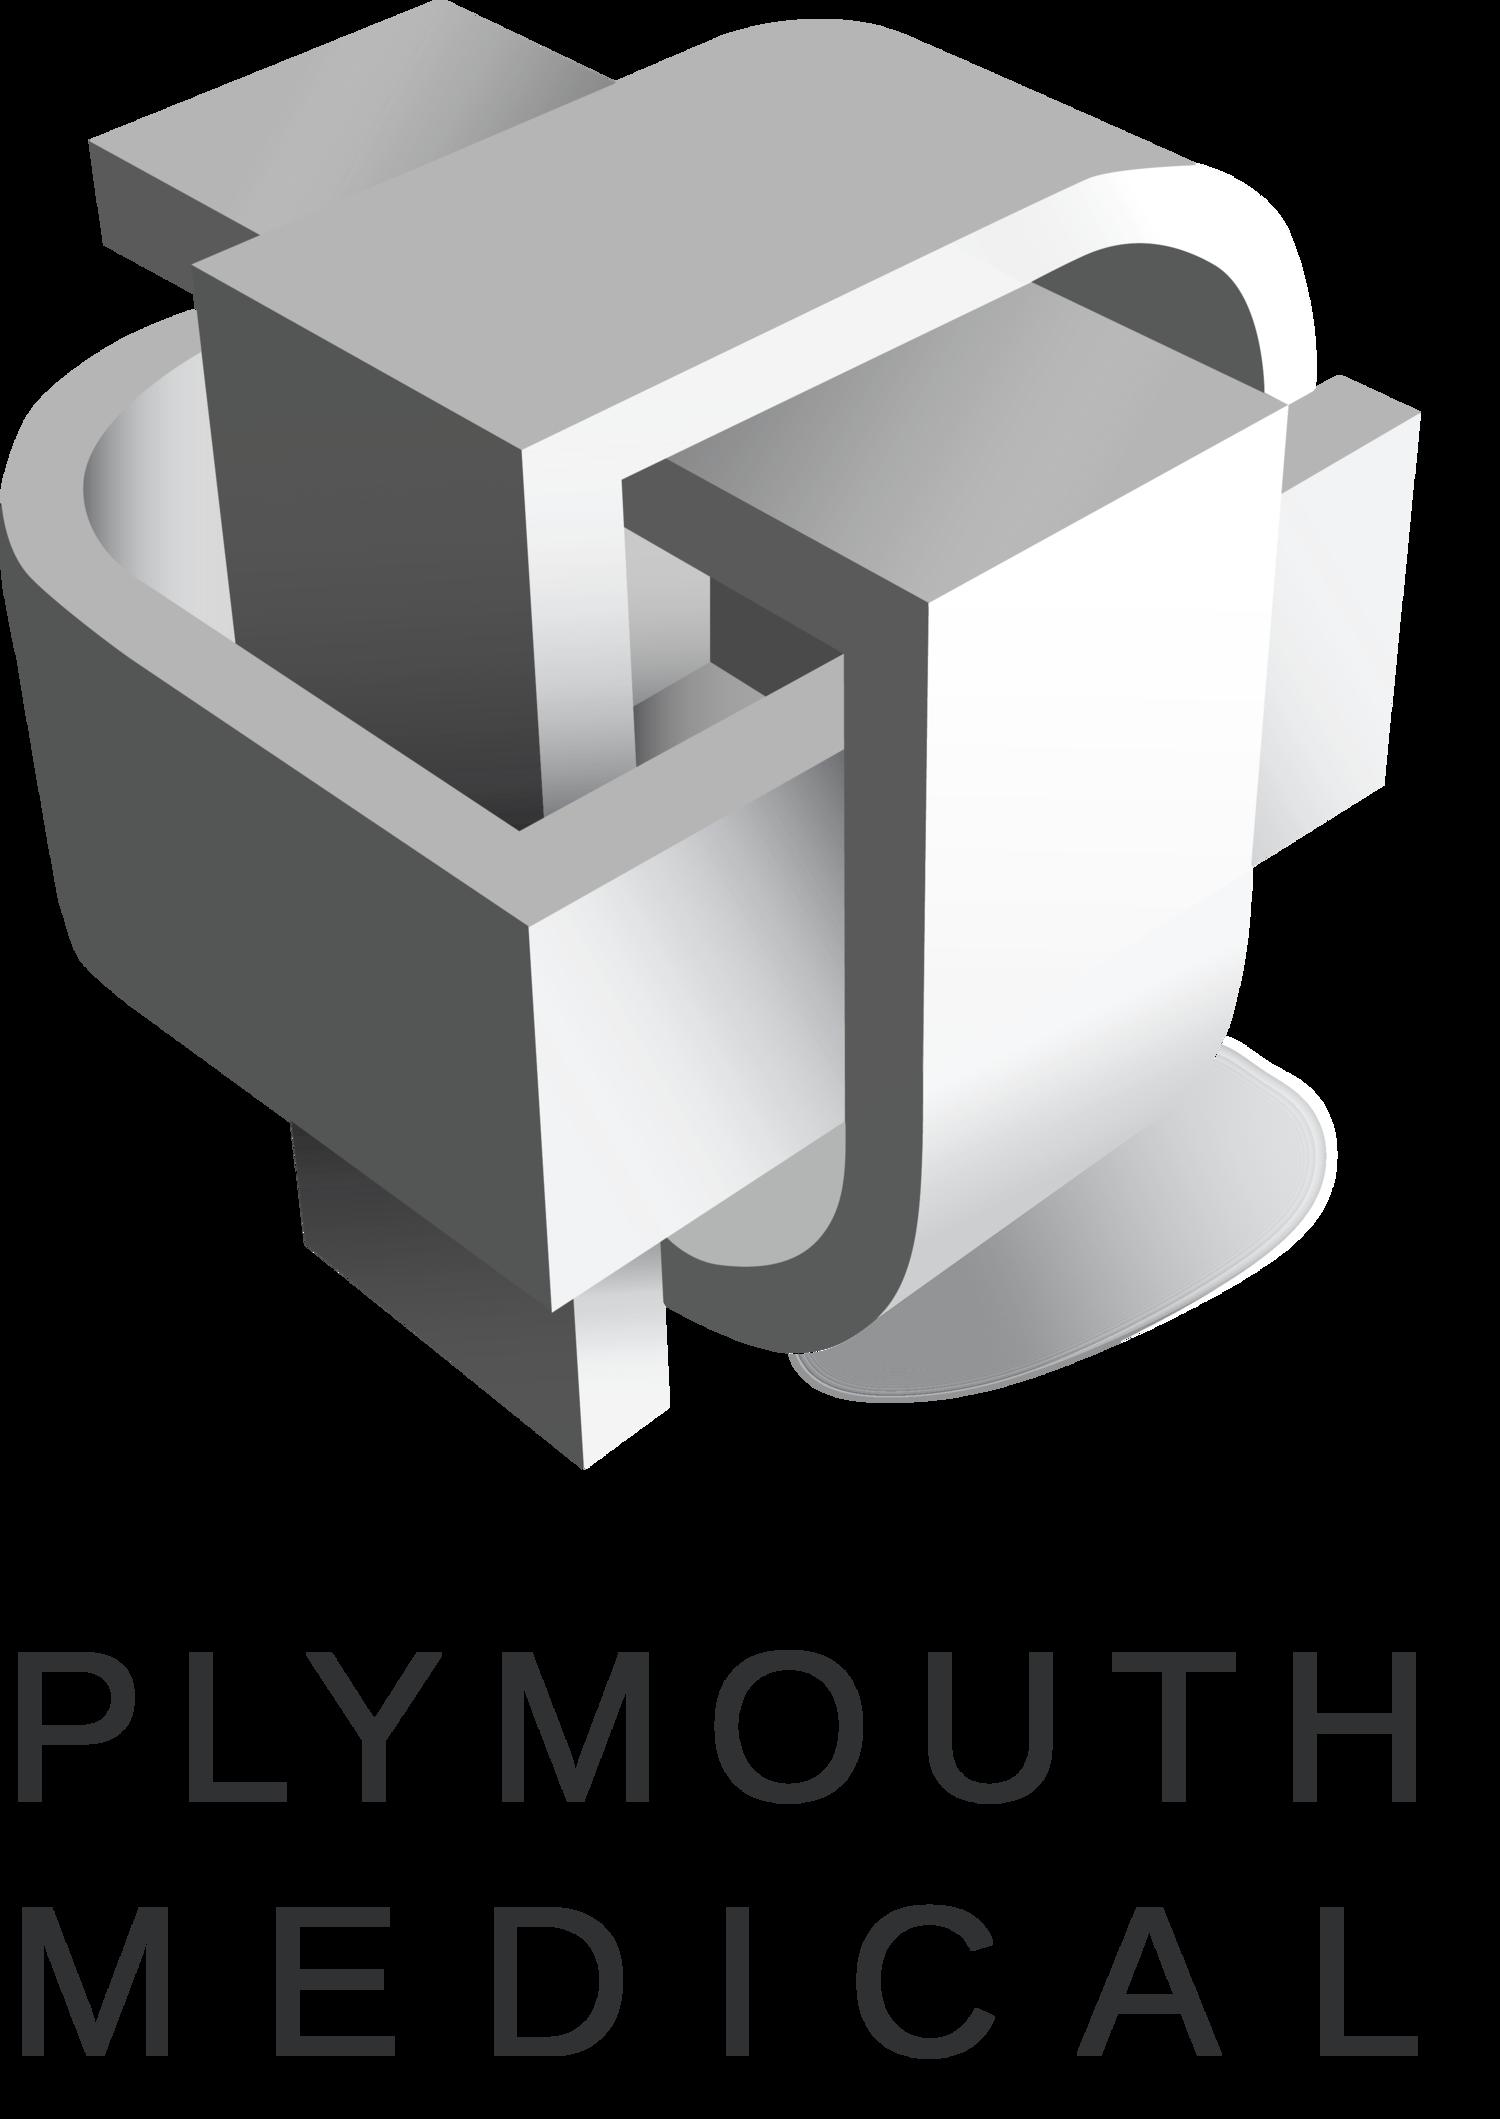 Plymouth+Medical+Logo